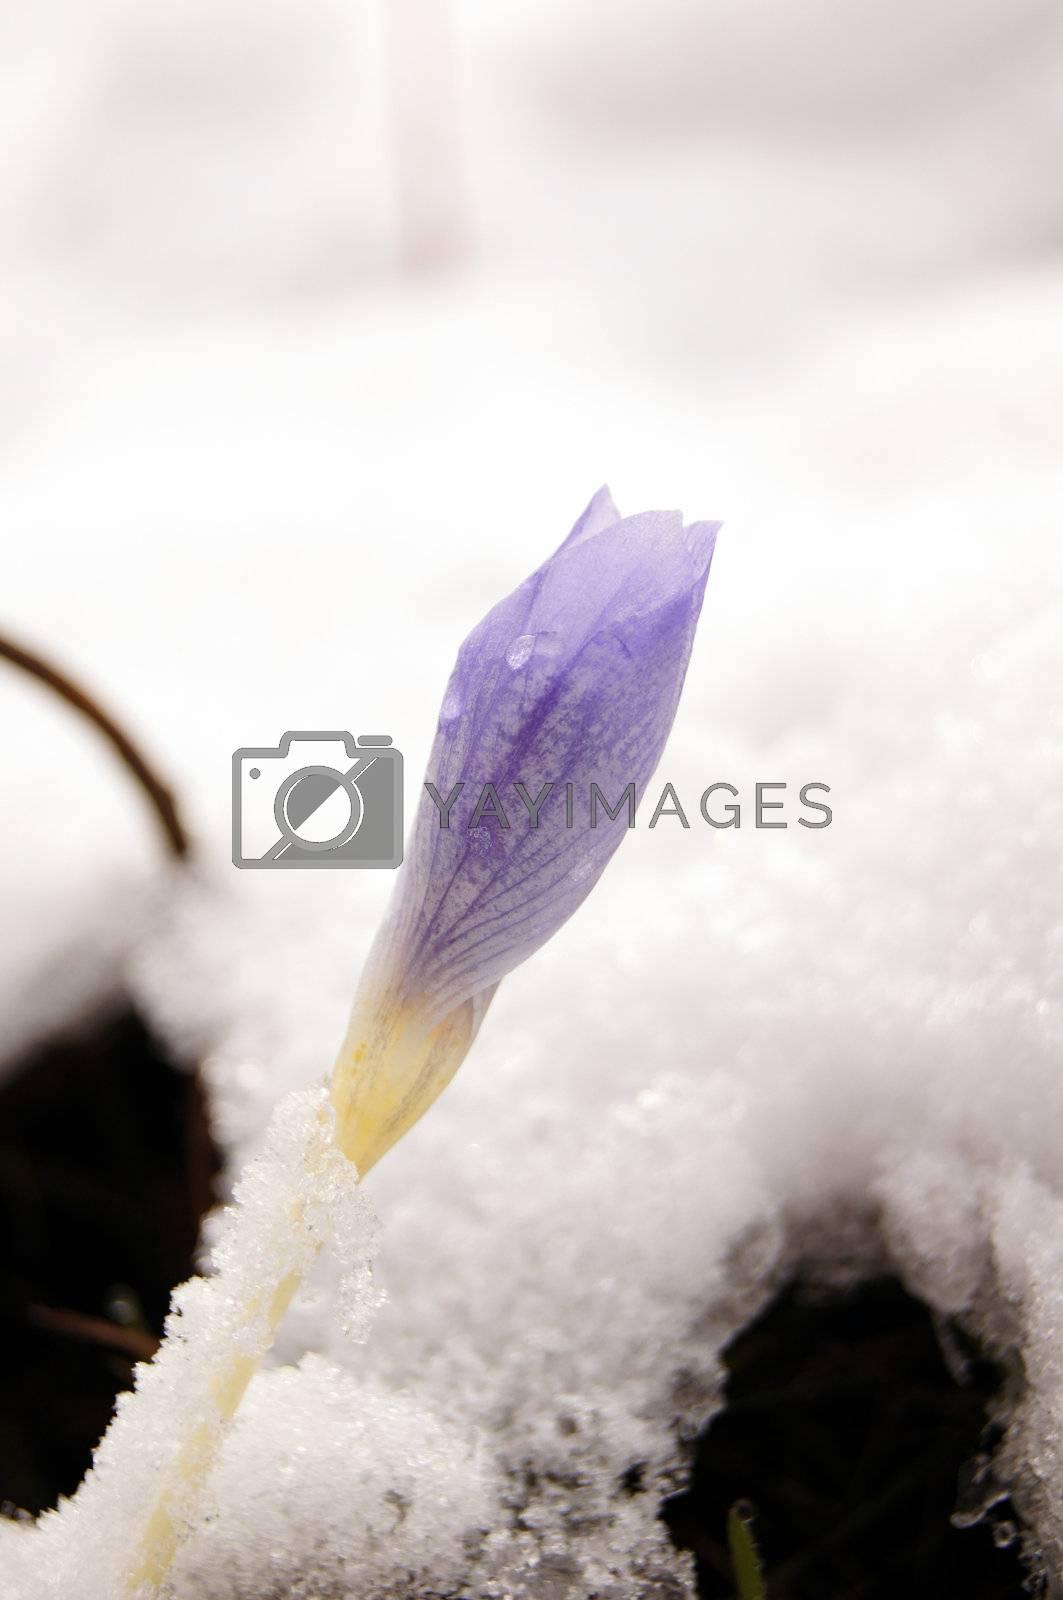 Blue crocus flowers under the first snow